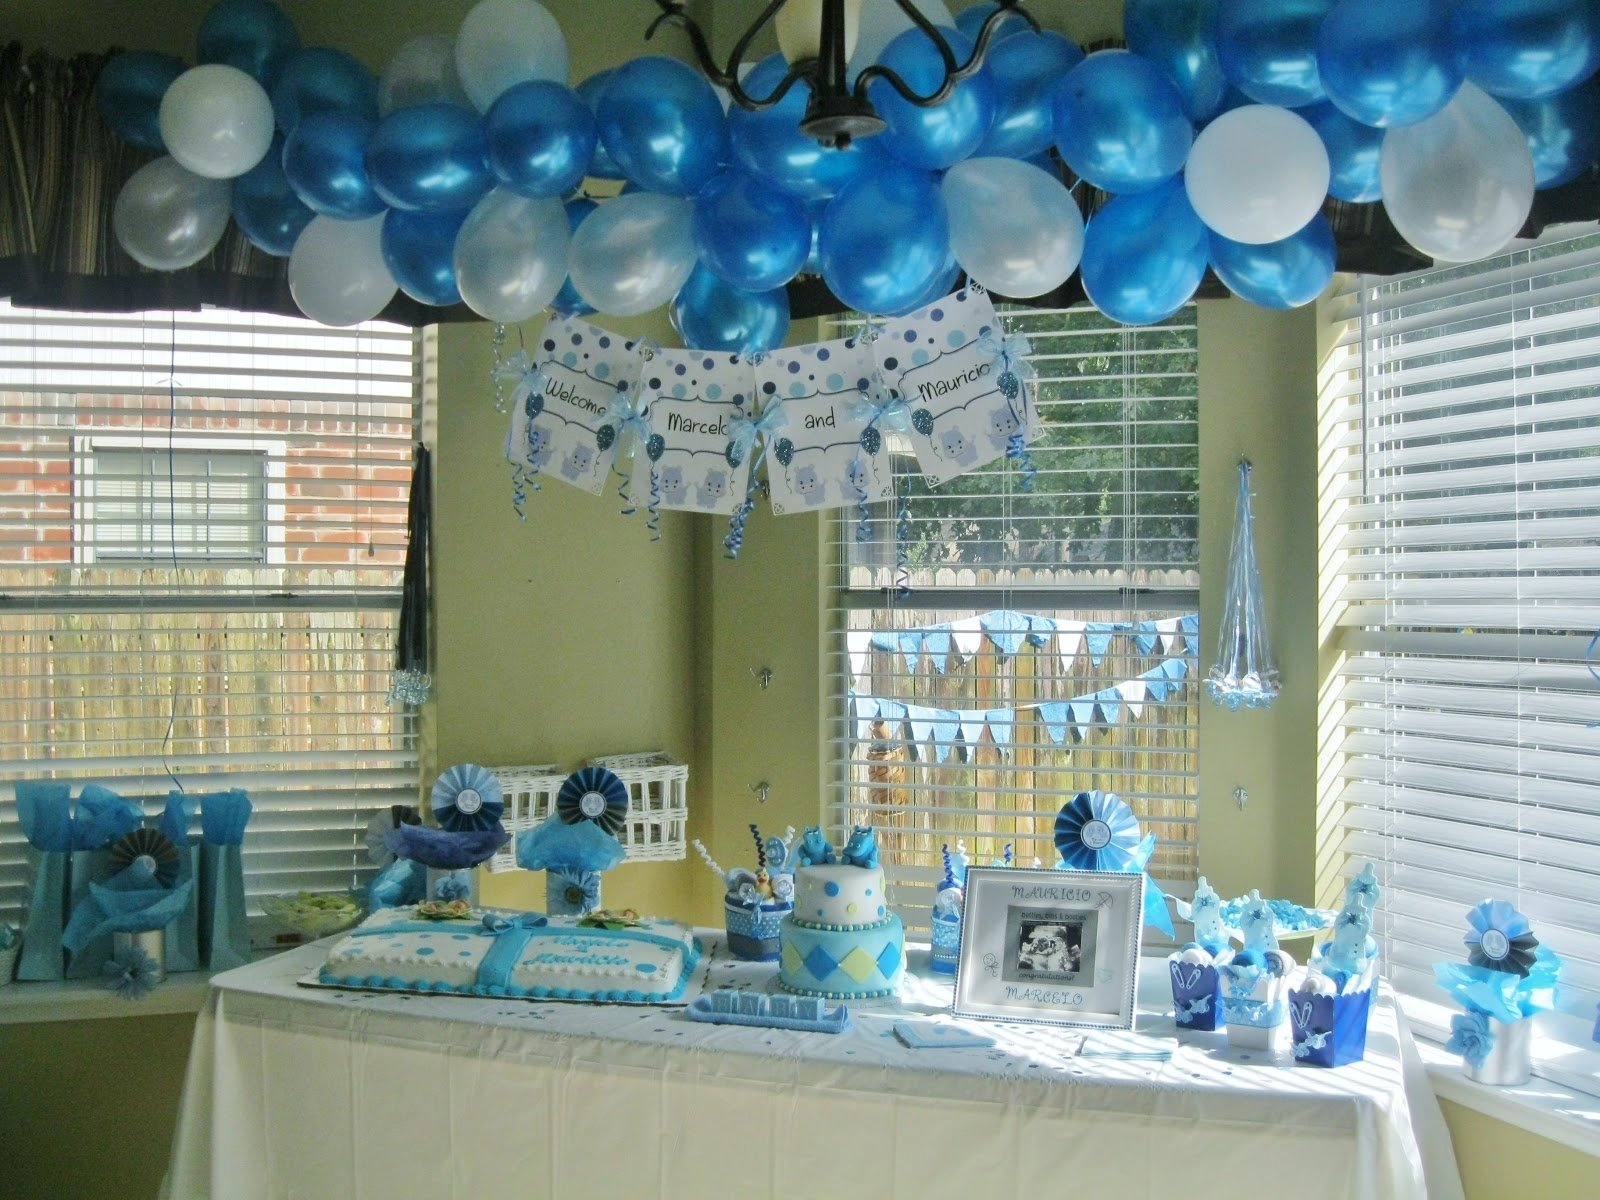 10 Amazing Baby Shower Ideas For Boy amazing baby shower ideas for boys 17 party snacks white chocolate